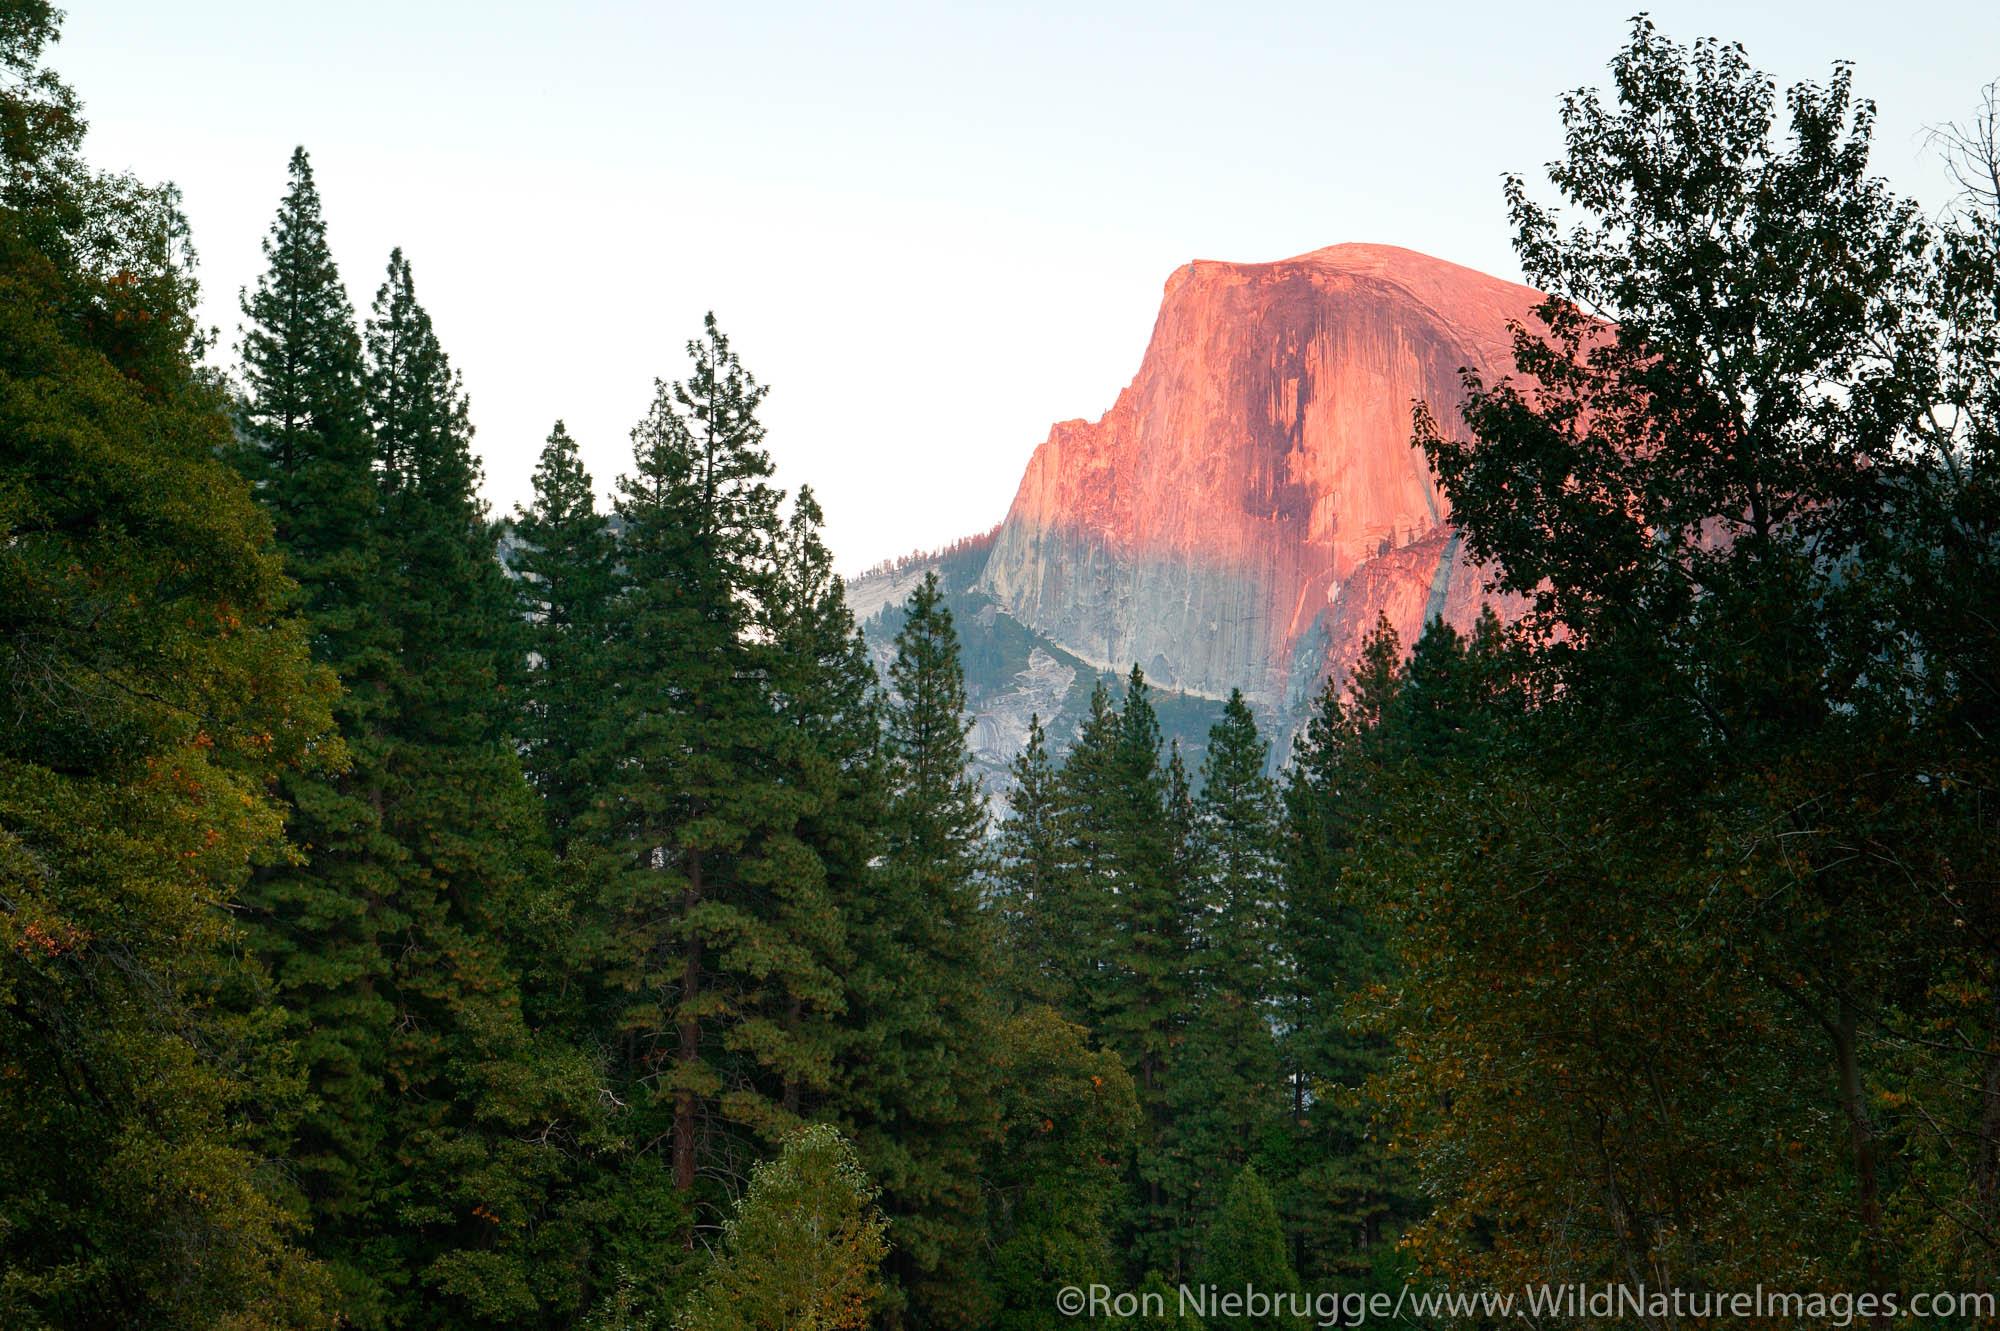 Half Dome at sunset, Yosemite National Park, California.